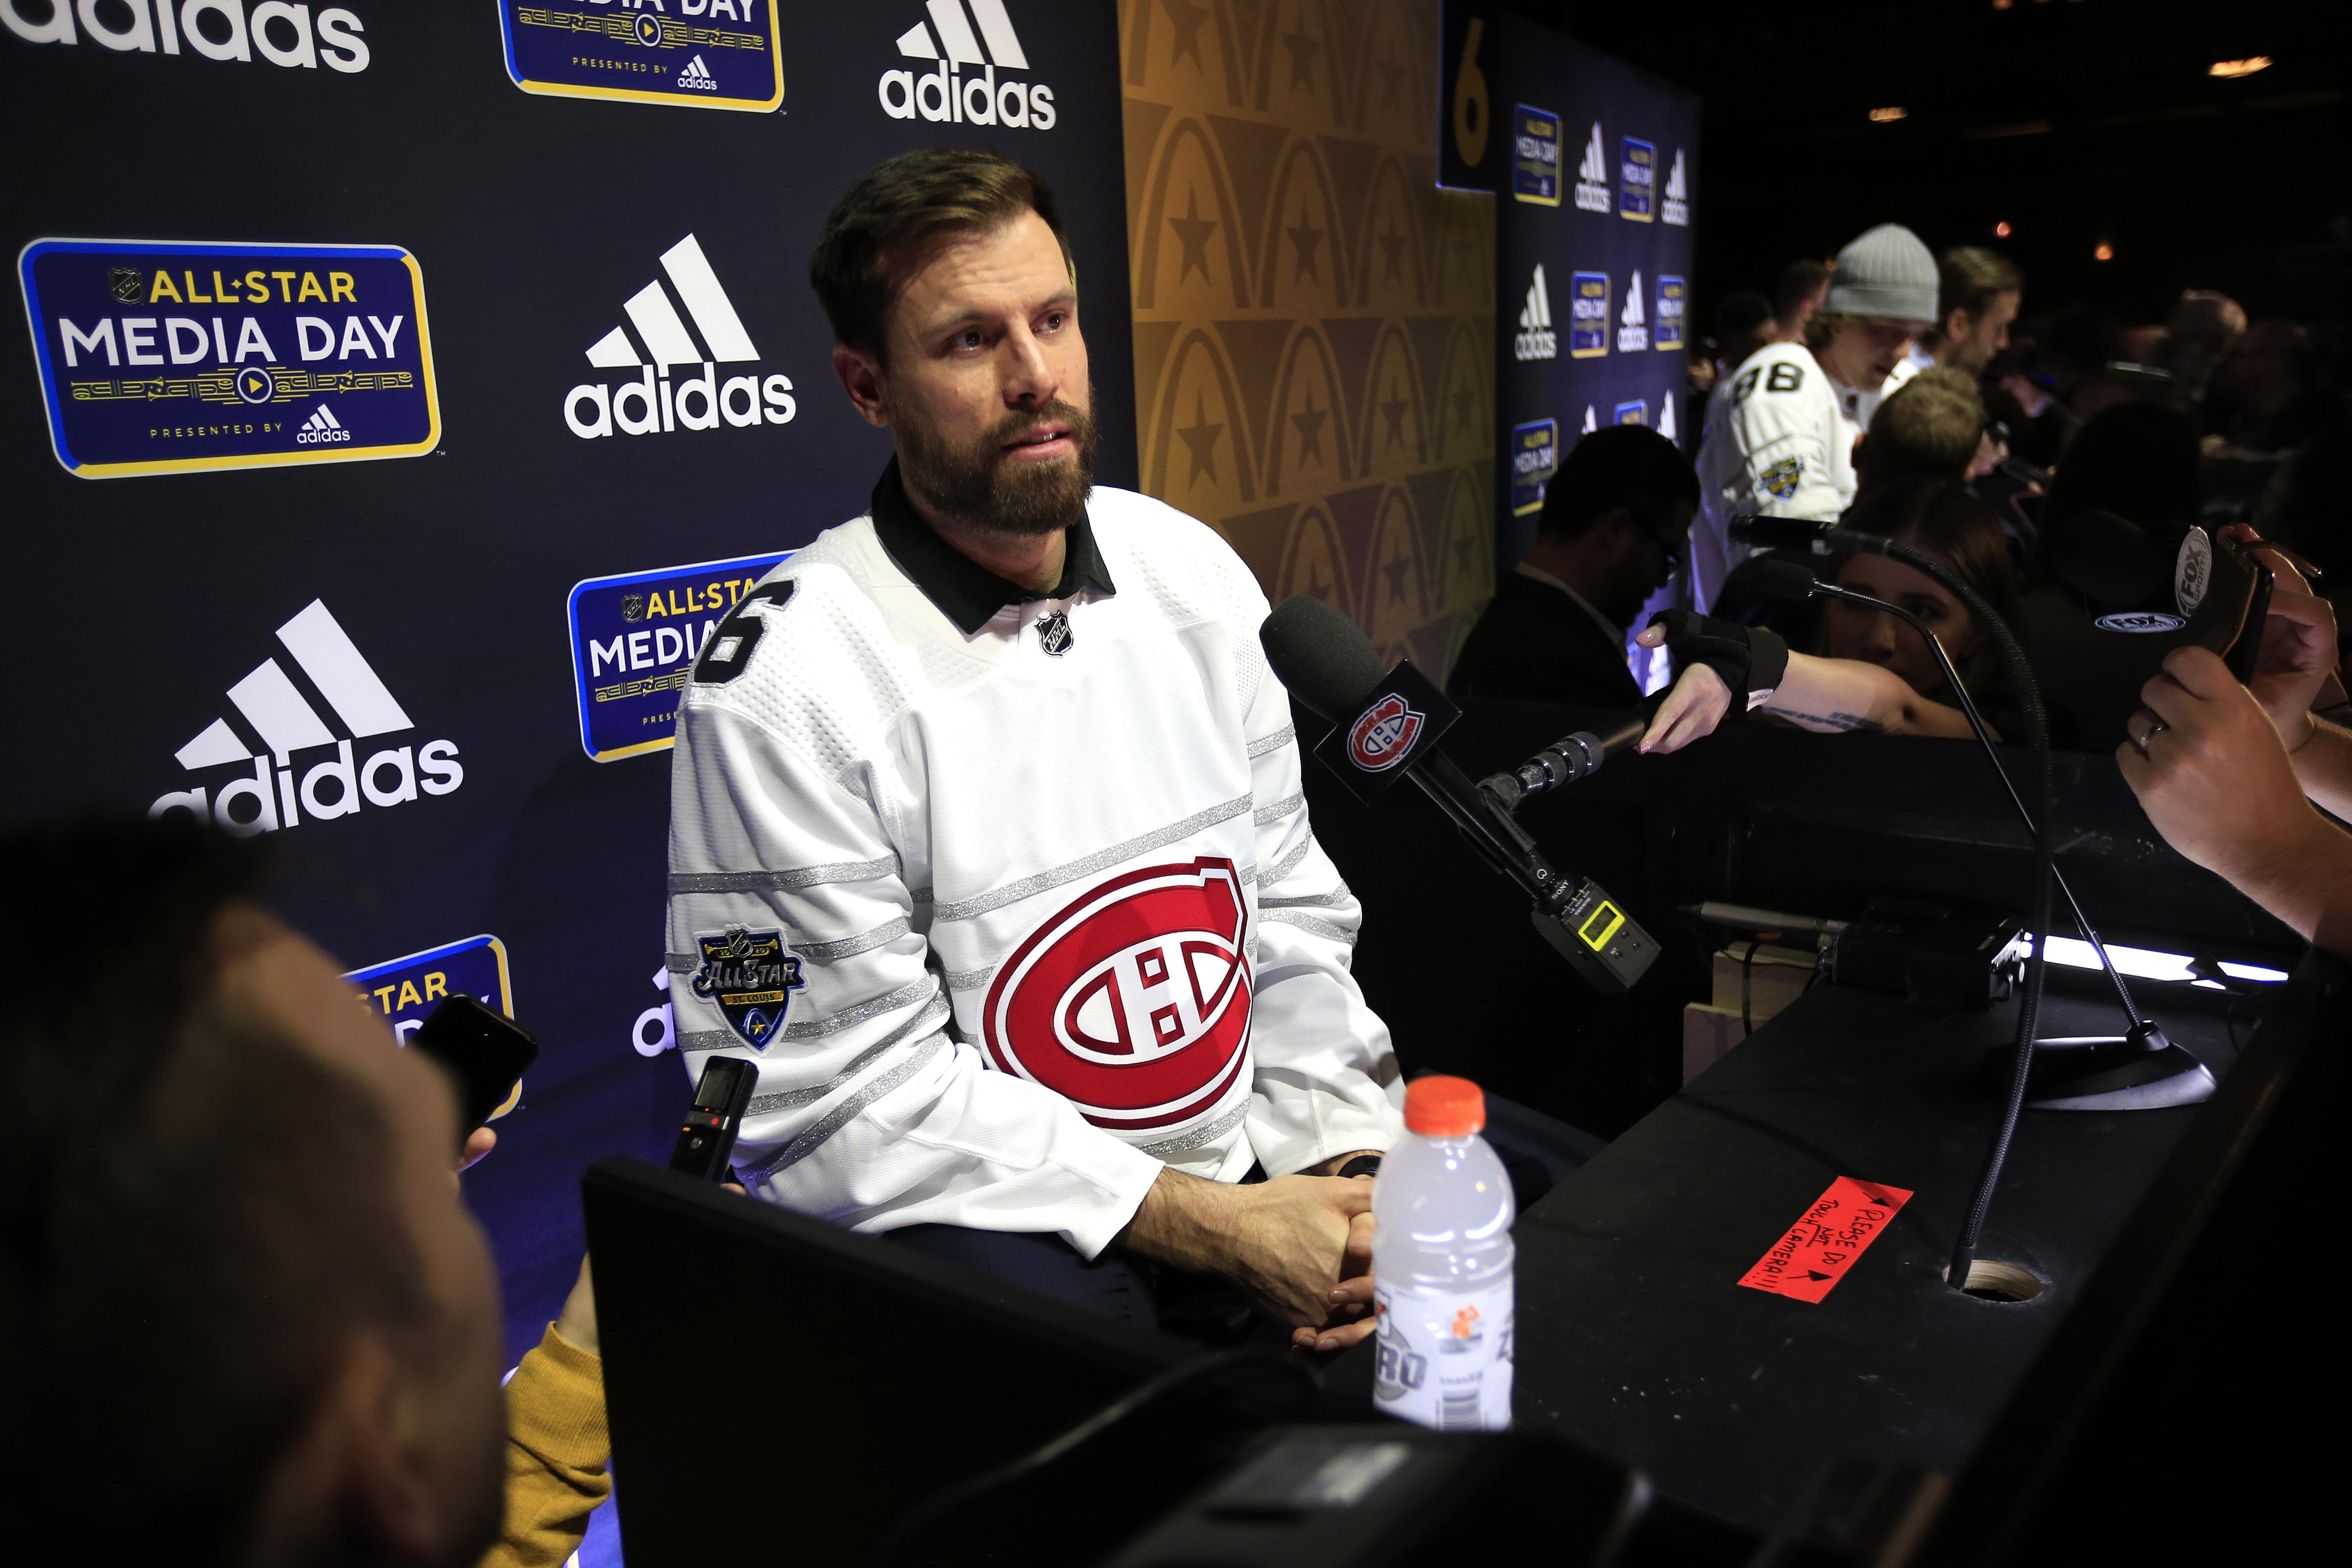 2020 NHL All-Star - Media Day